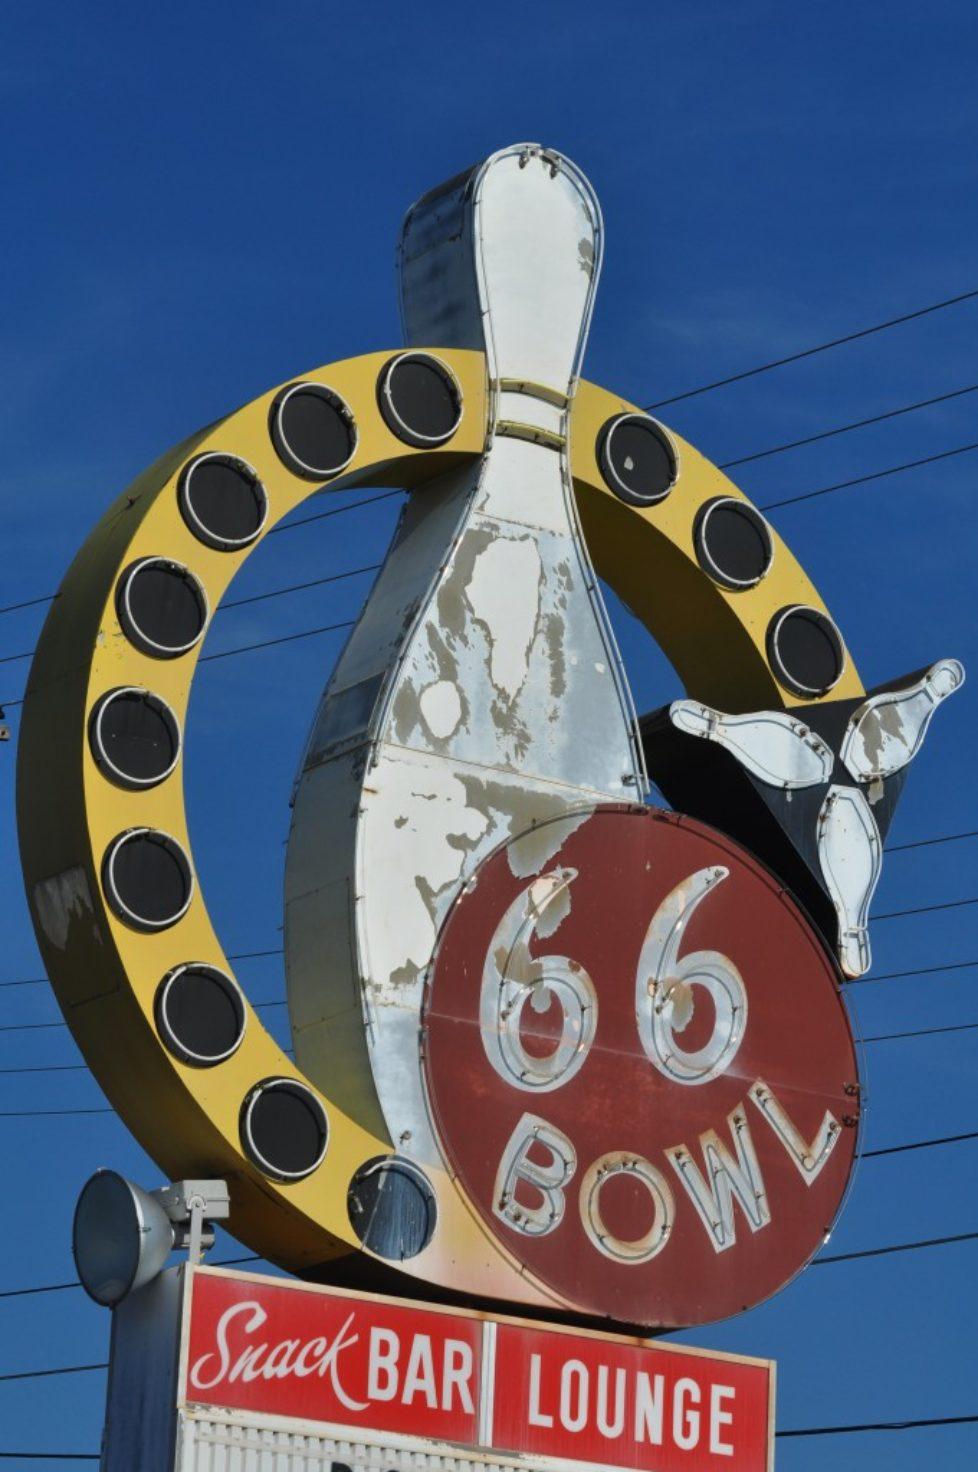 66 Bowl